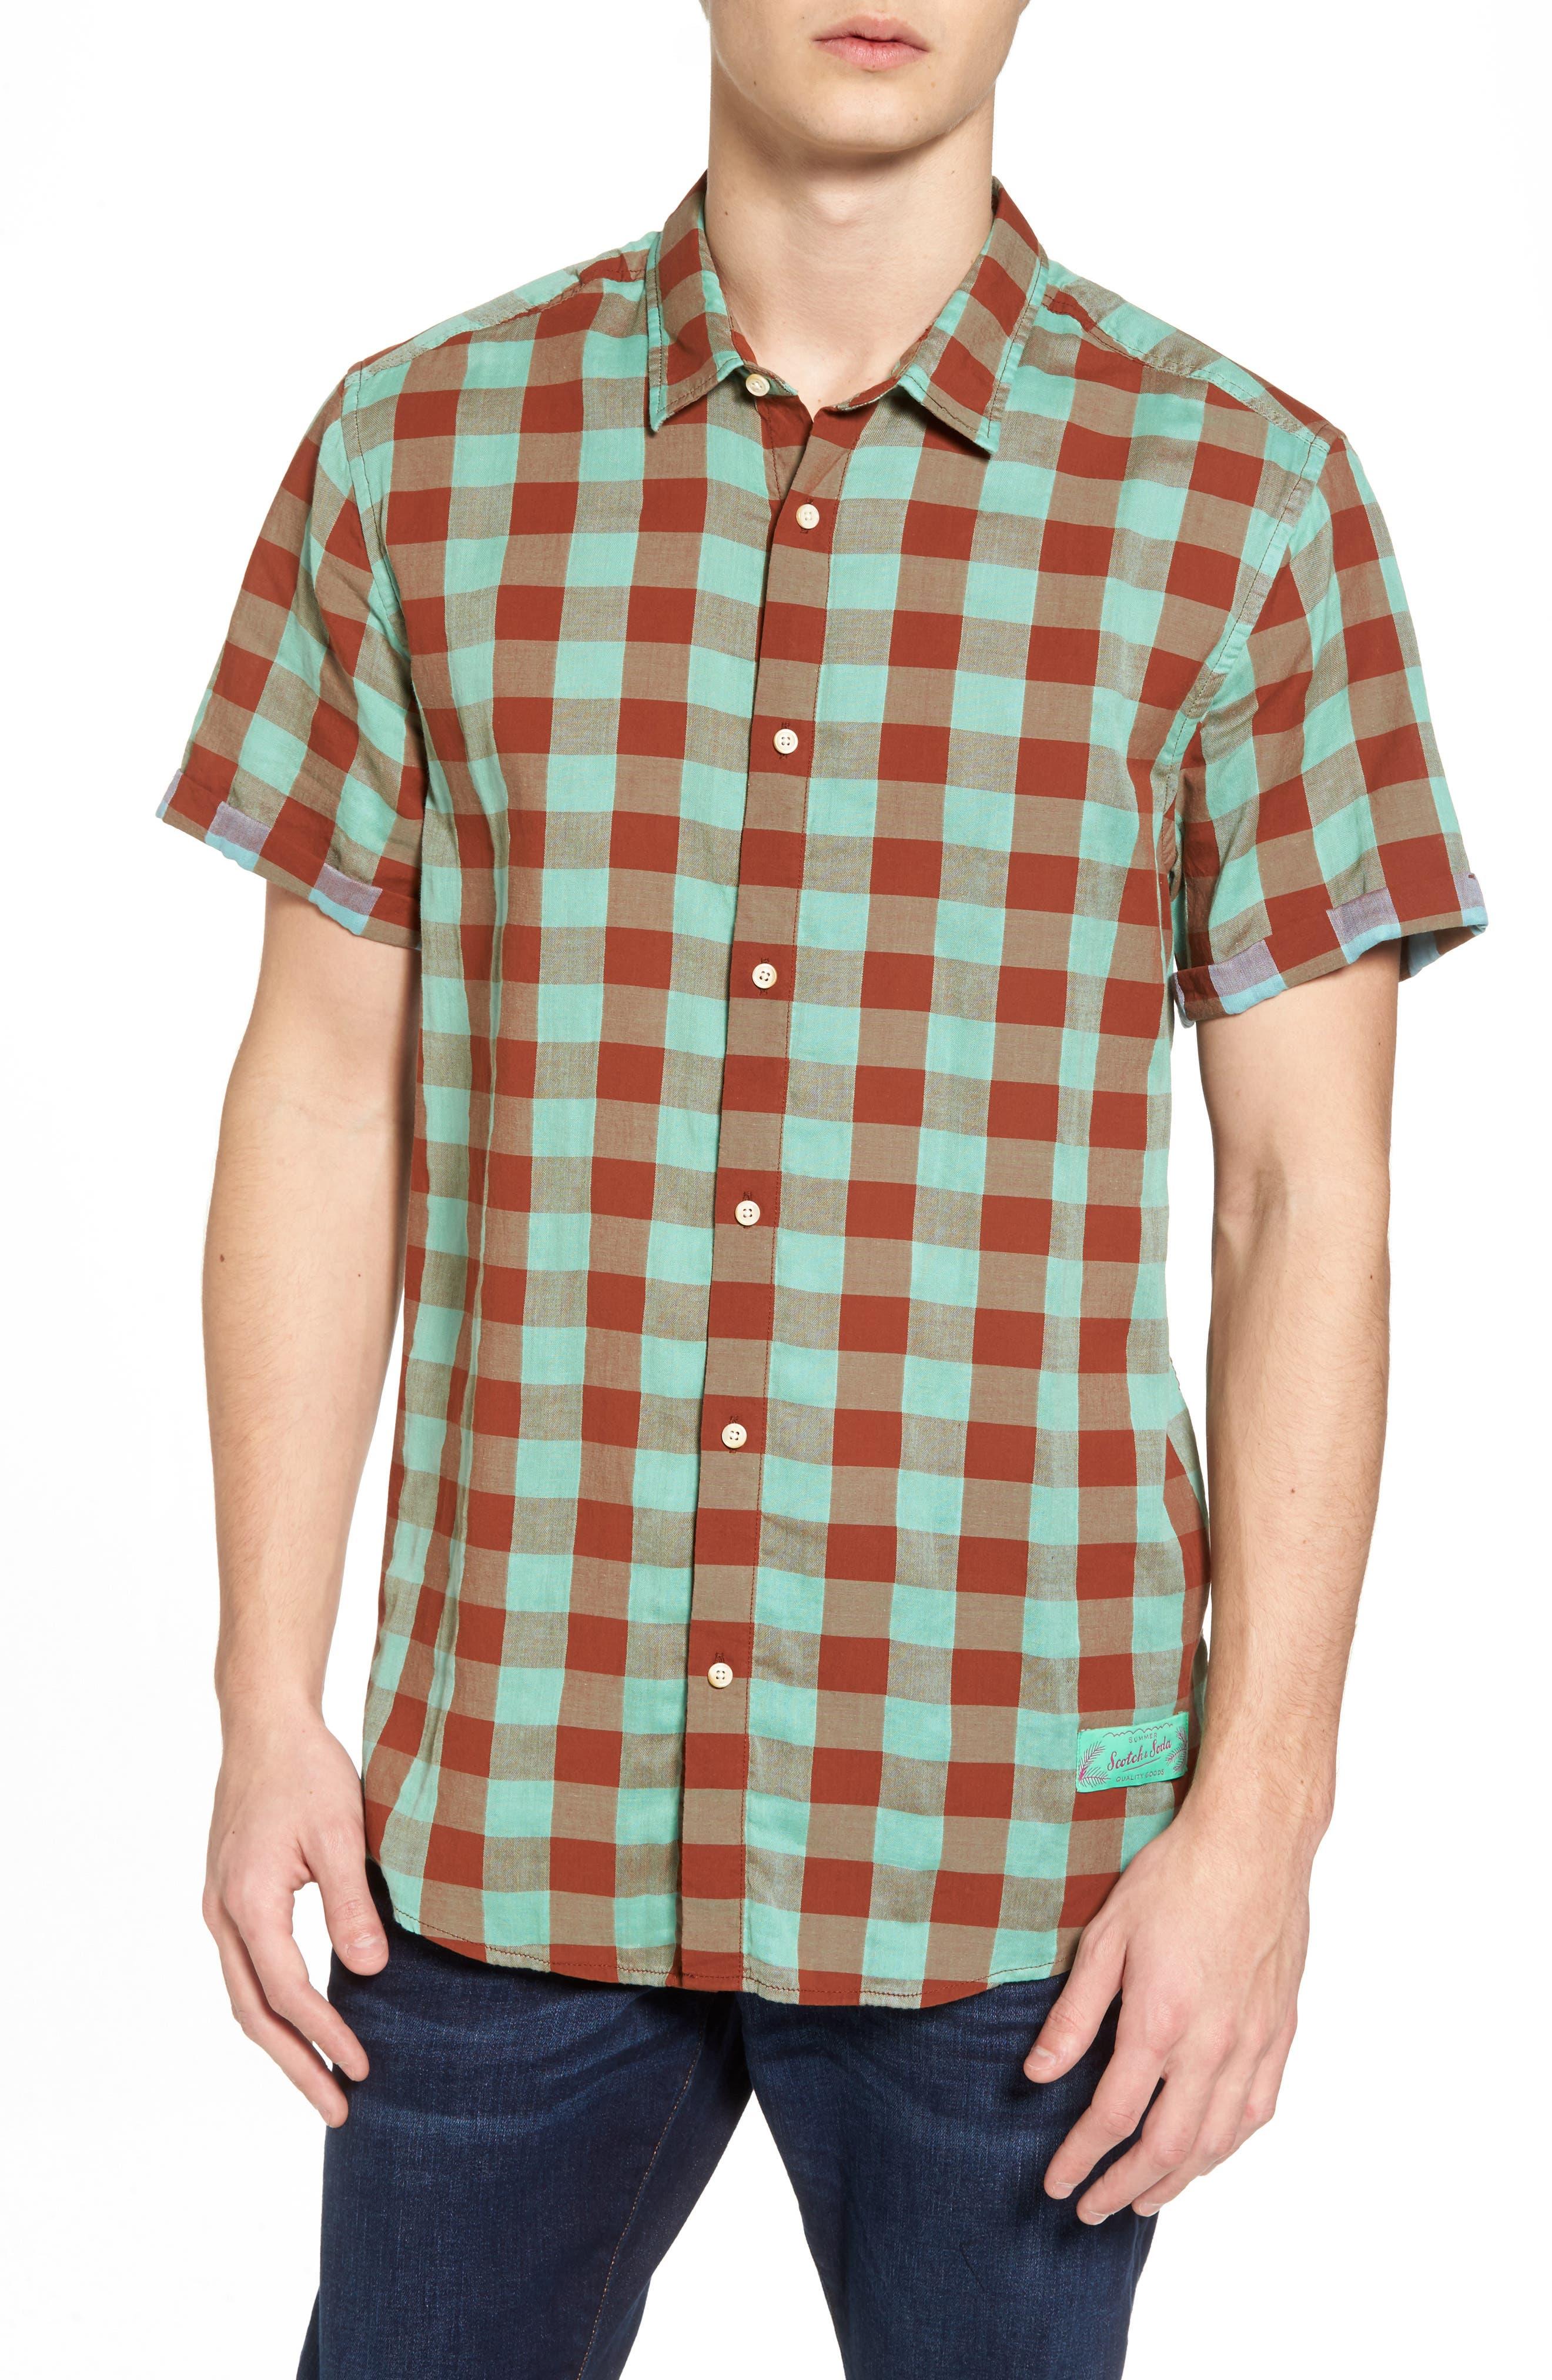 Check Woven Shirt by Scotch & Soda